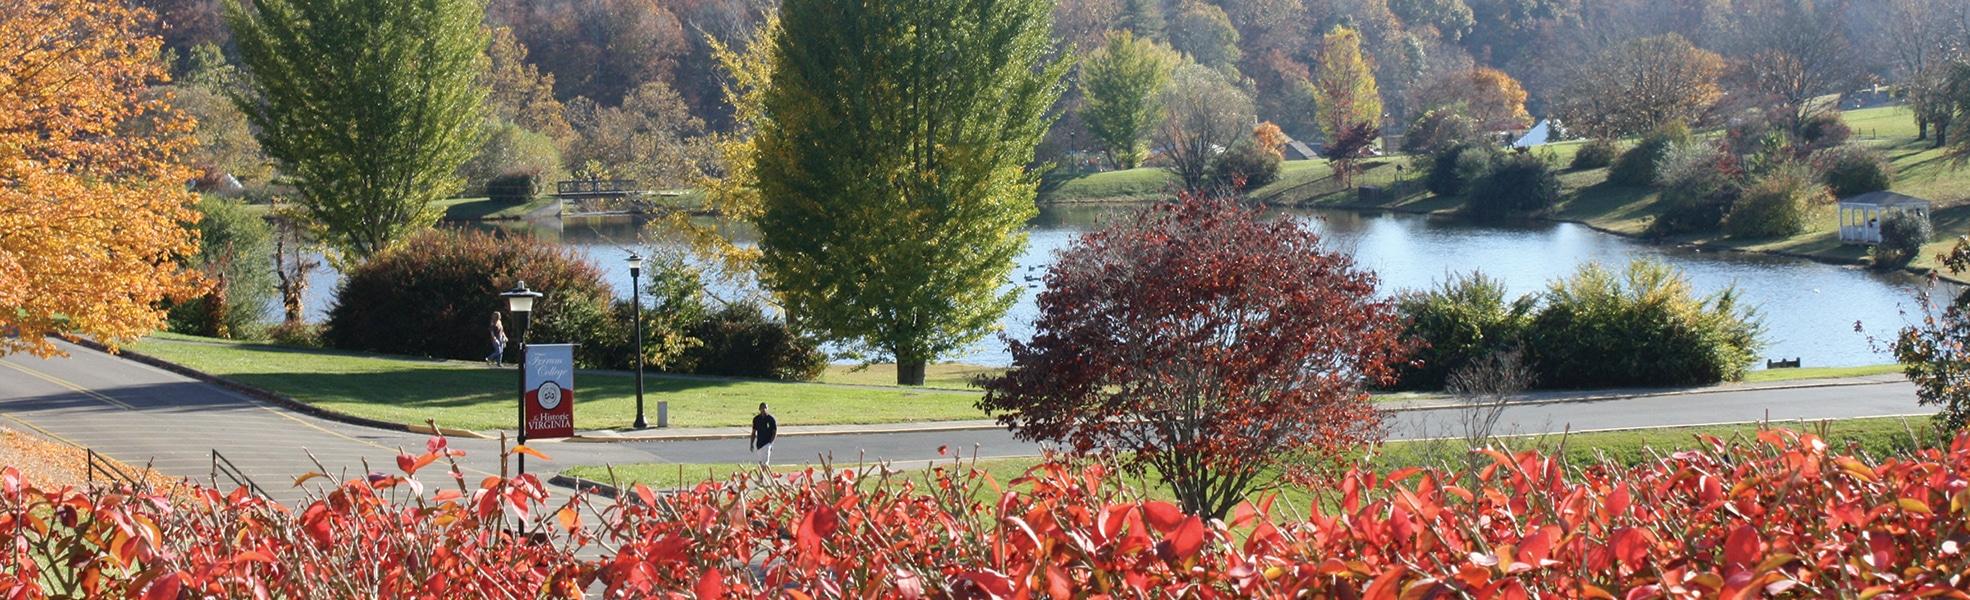 Ferrum College Adams Lake in the Fall